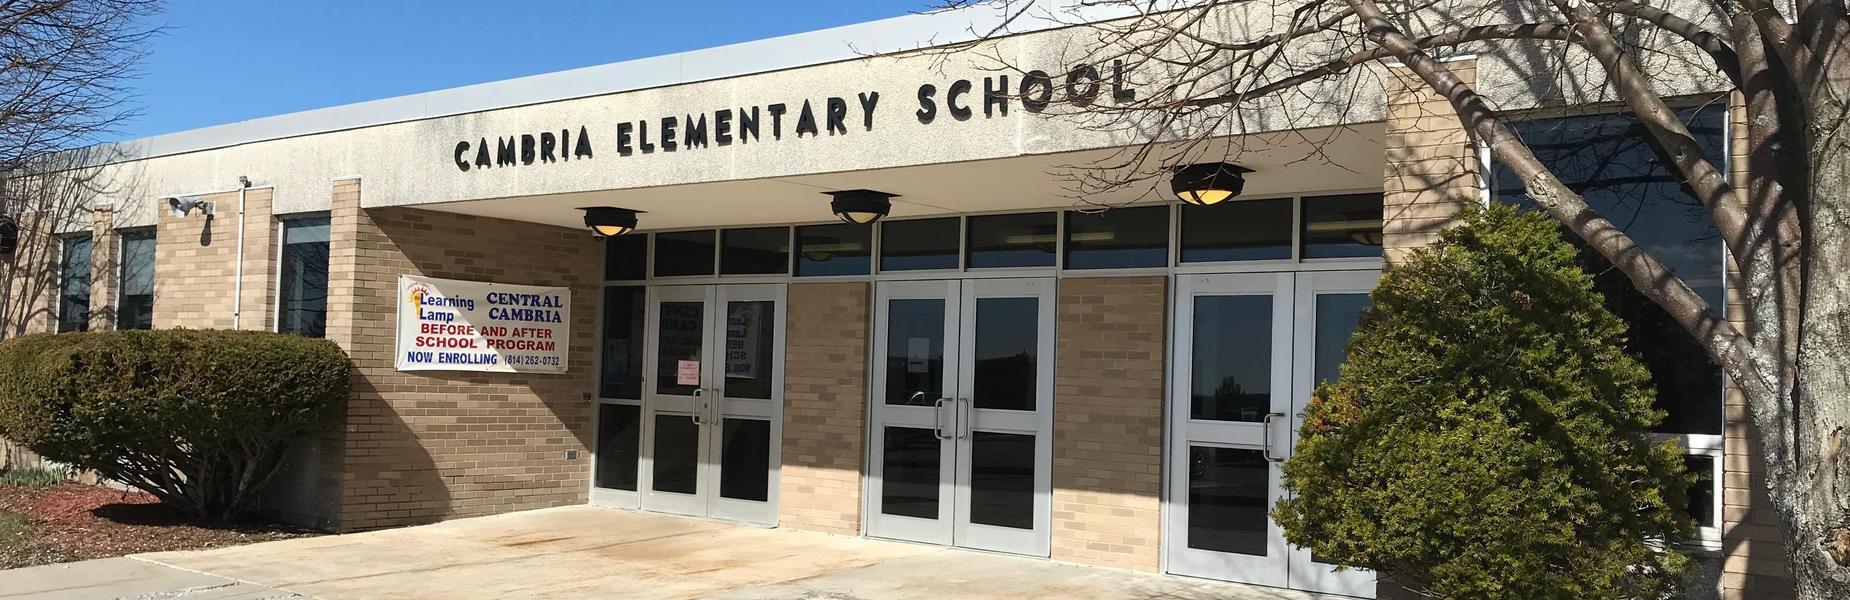 photo of cambria elementary school